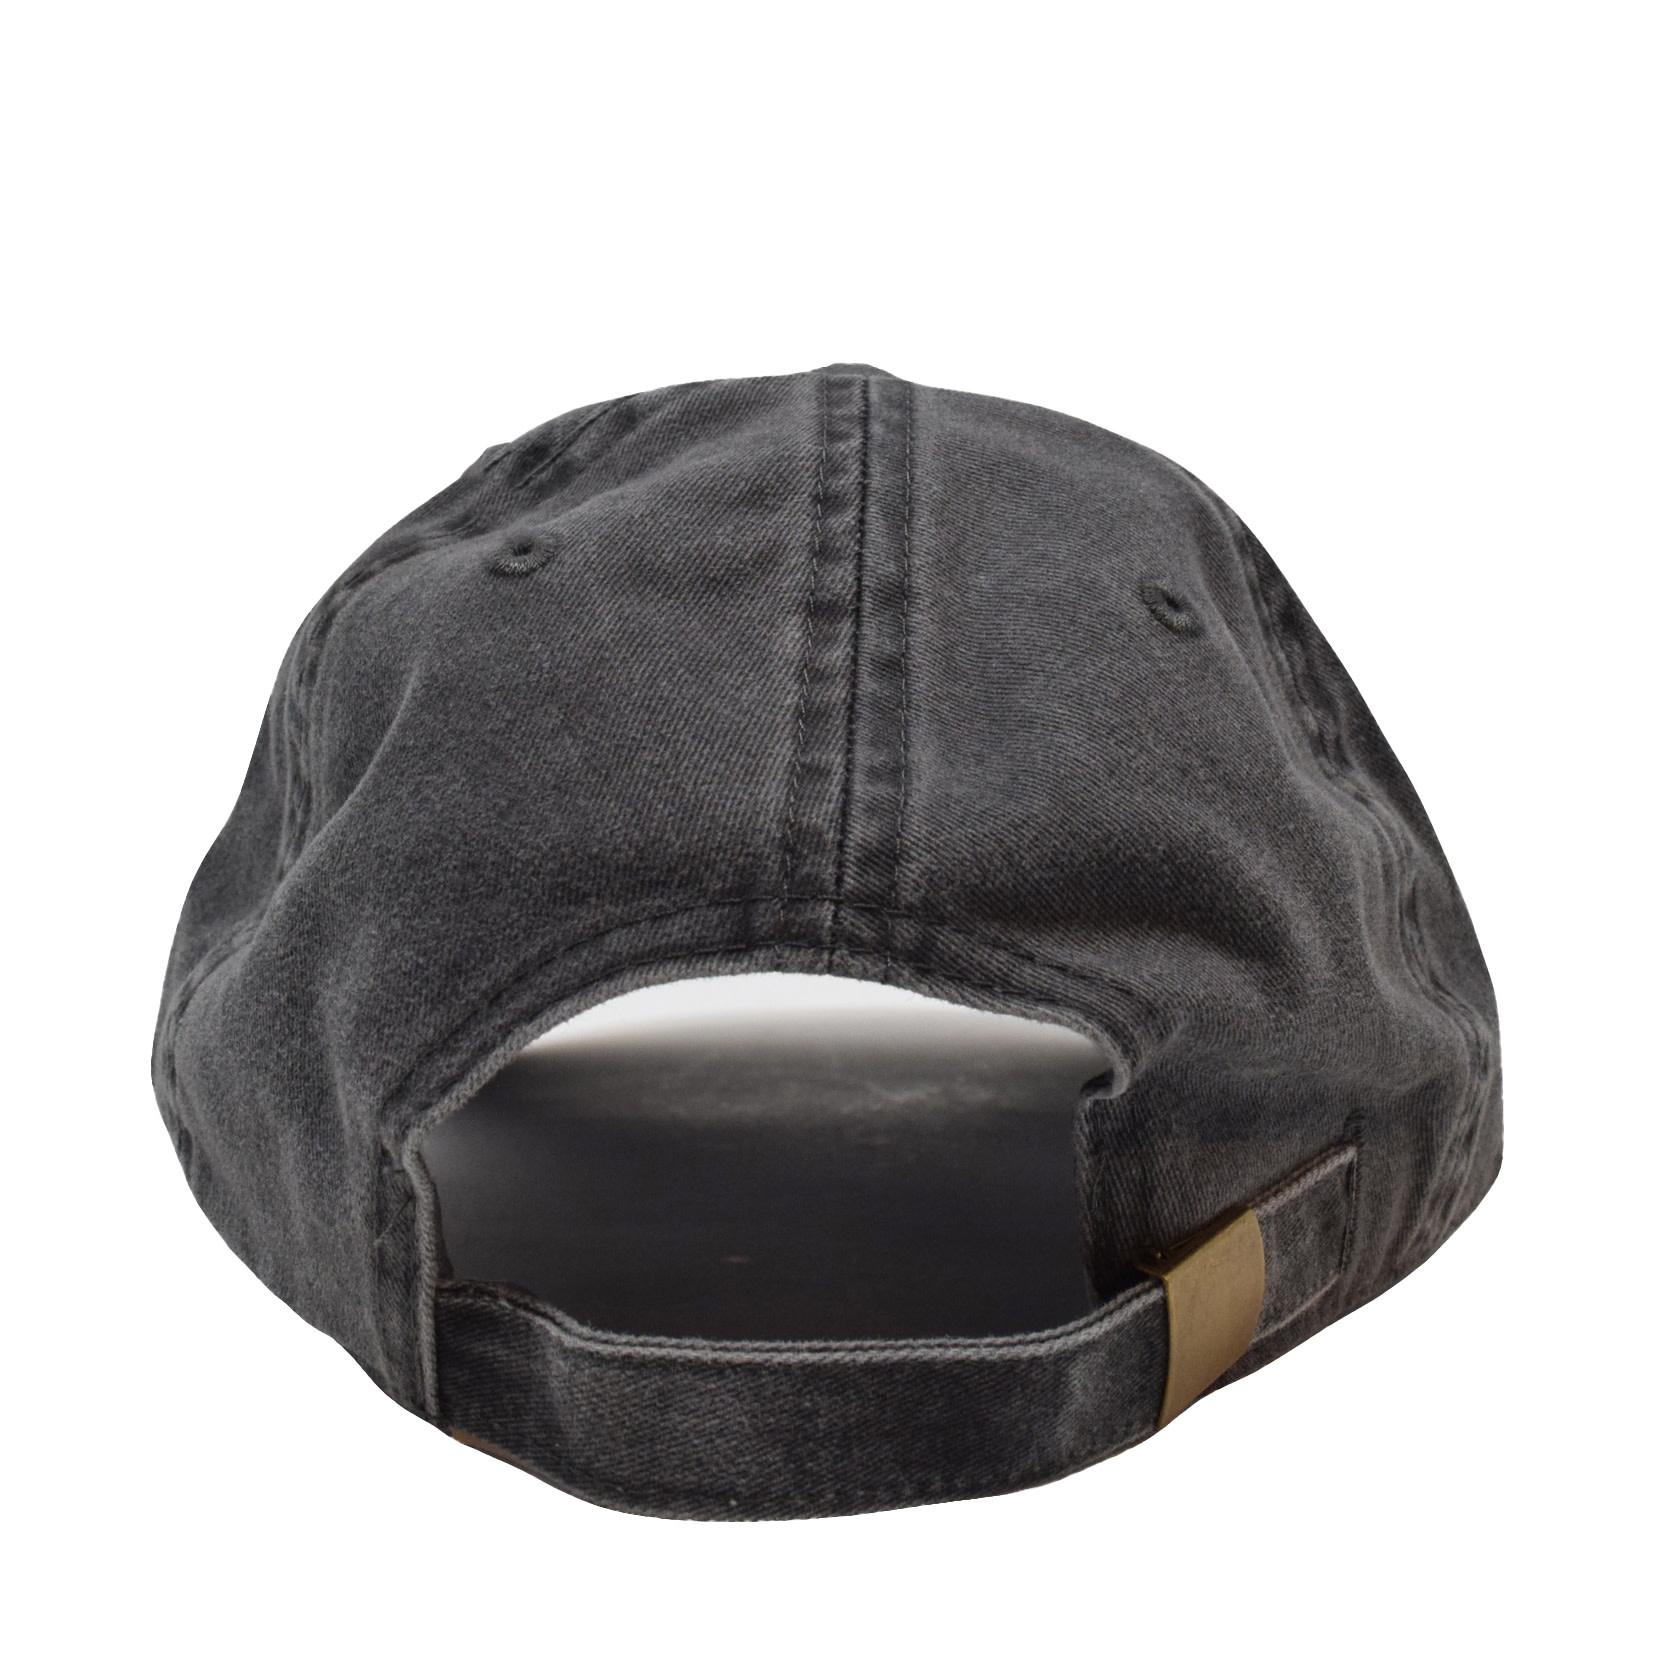 Berea College Retro Patch Vintage Ball Cap-5